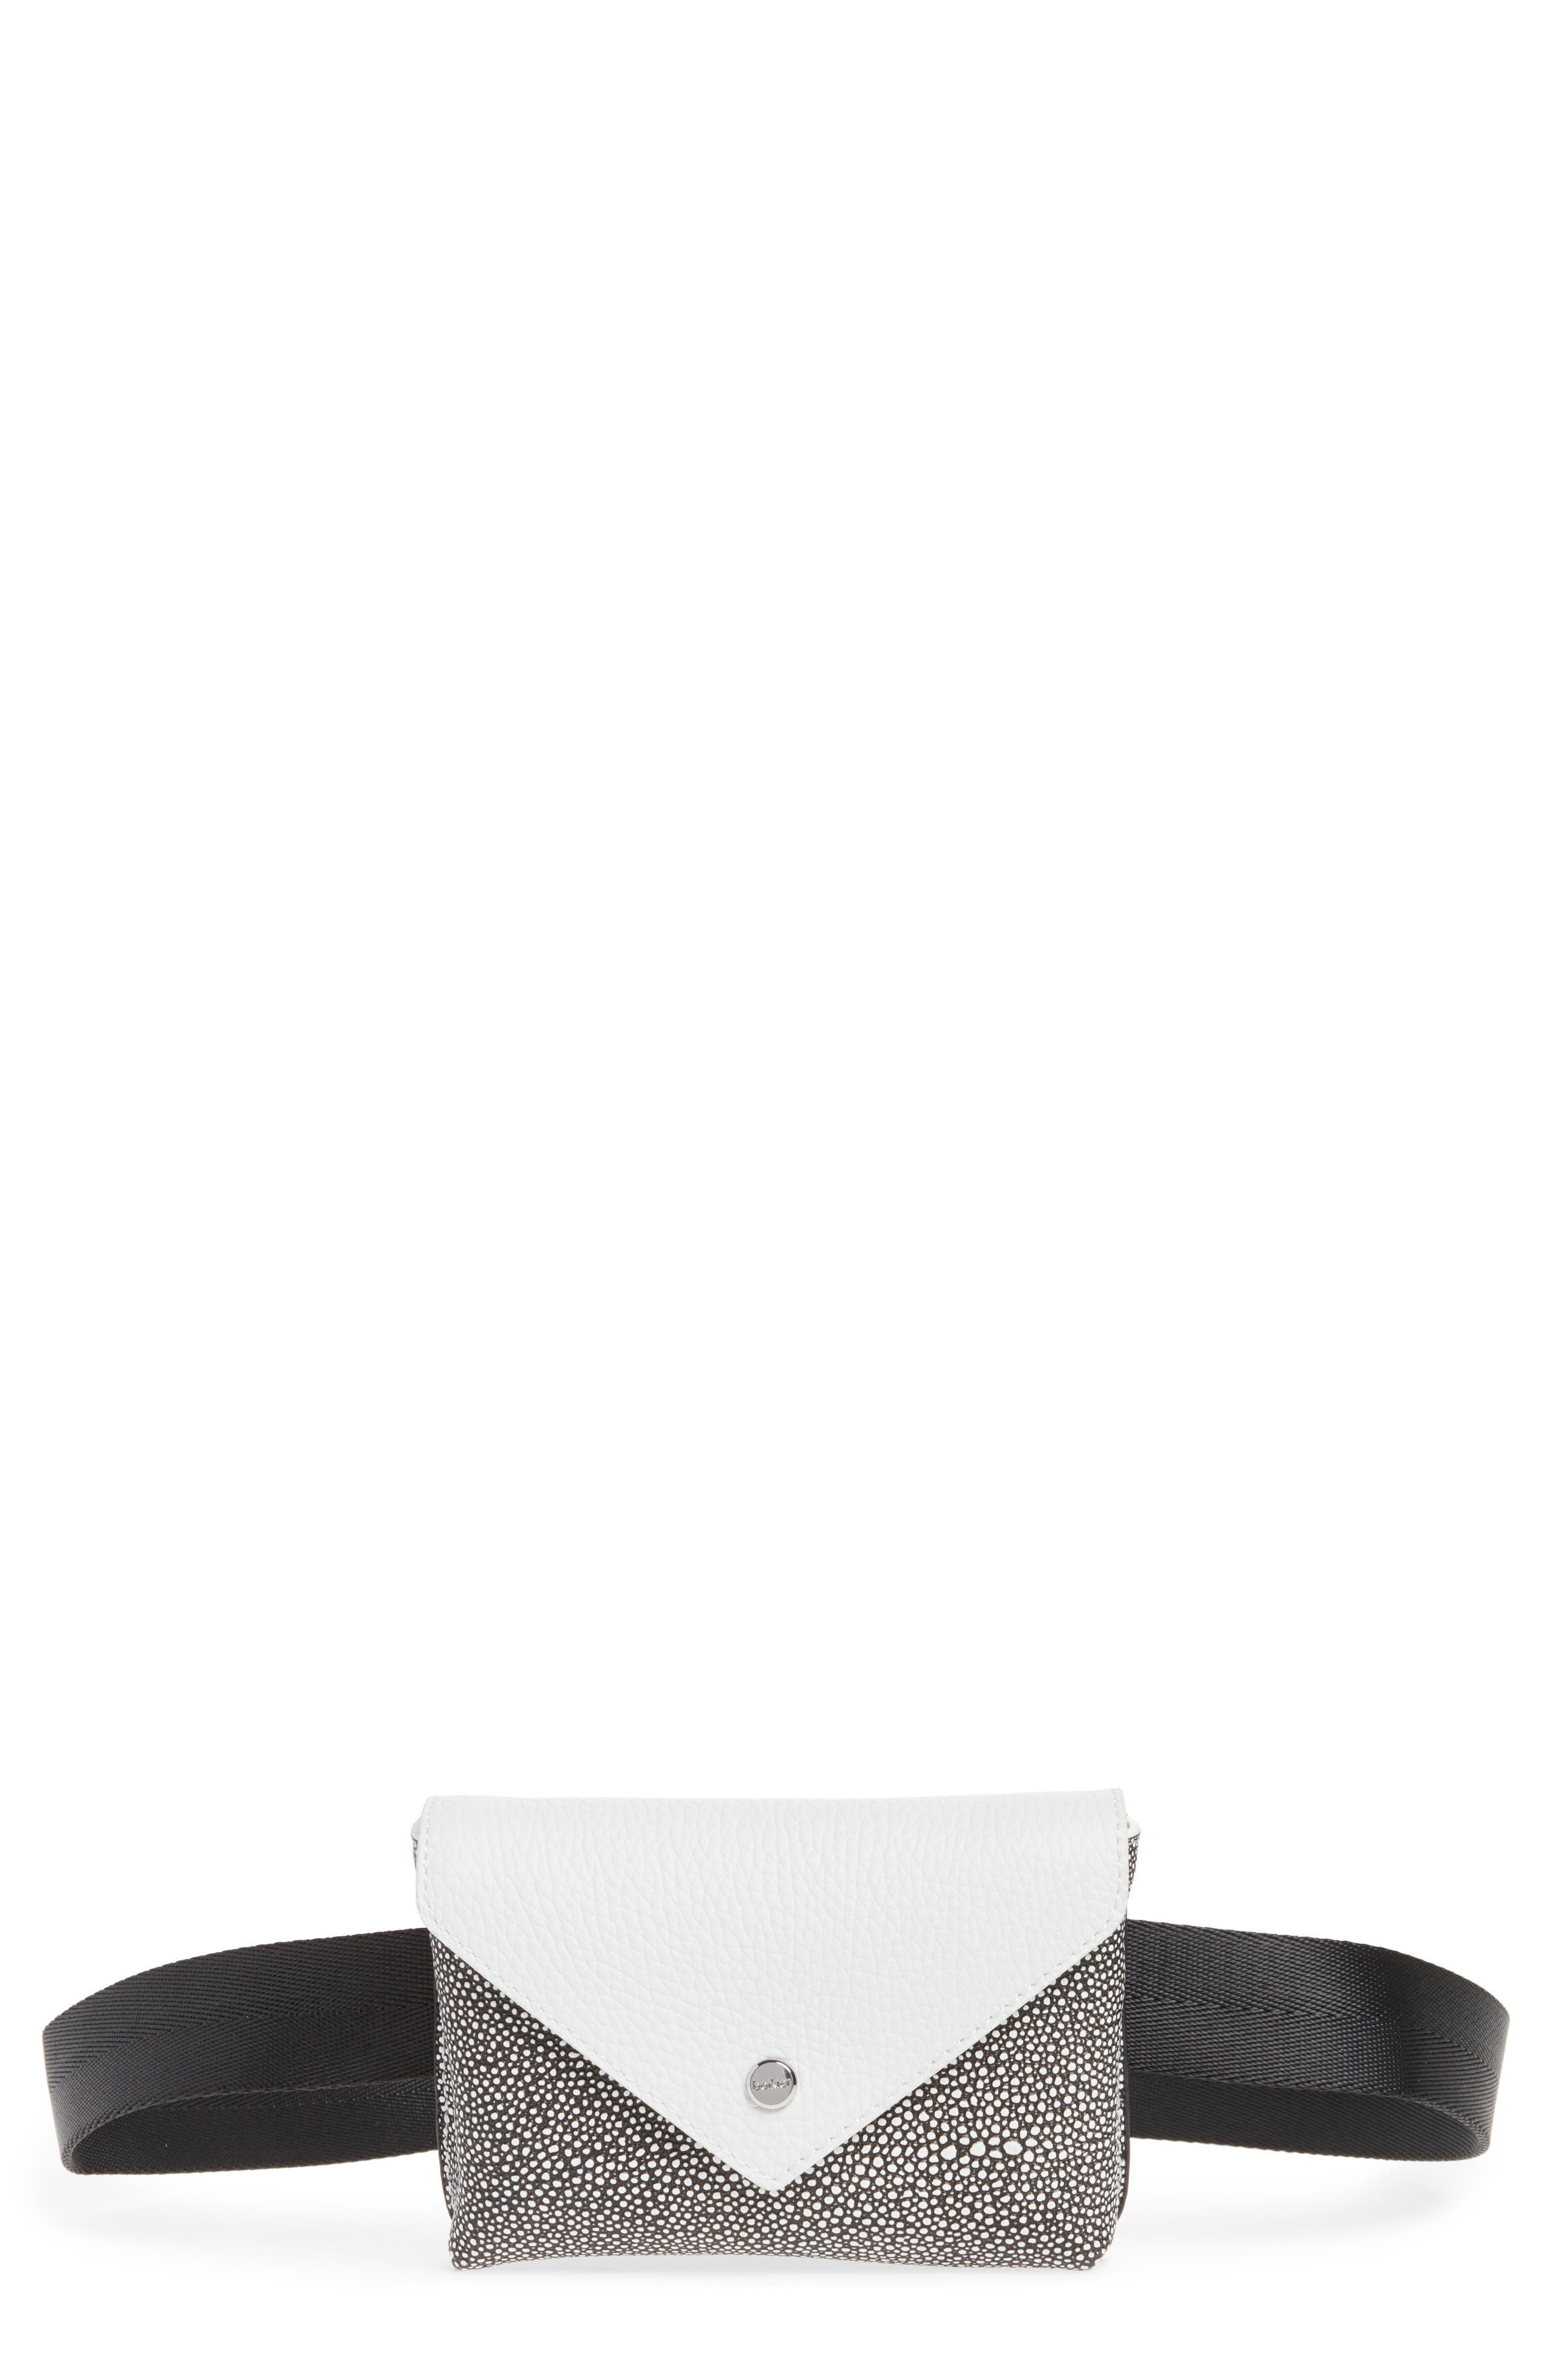 Vivi Calfskin Leather Convertible Belt Bag,                         Main,                         color, Chalk Stingray